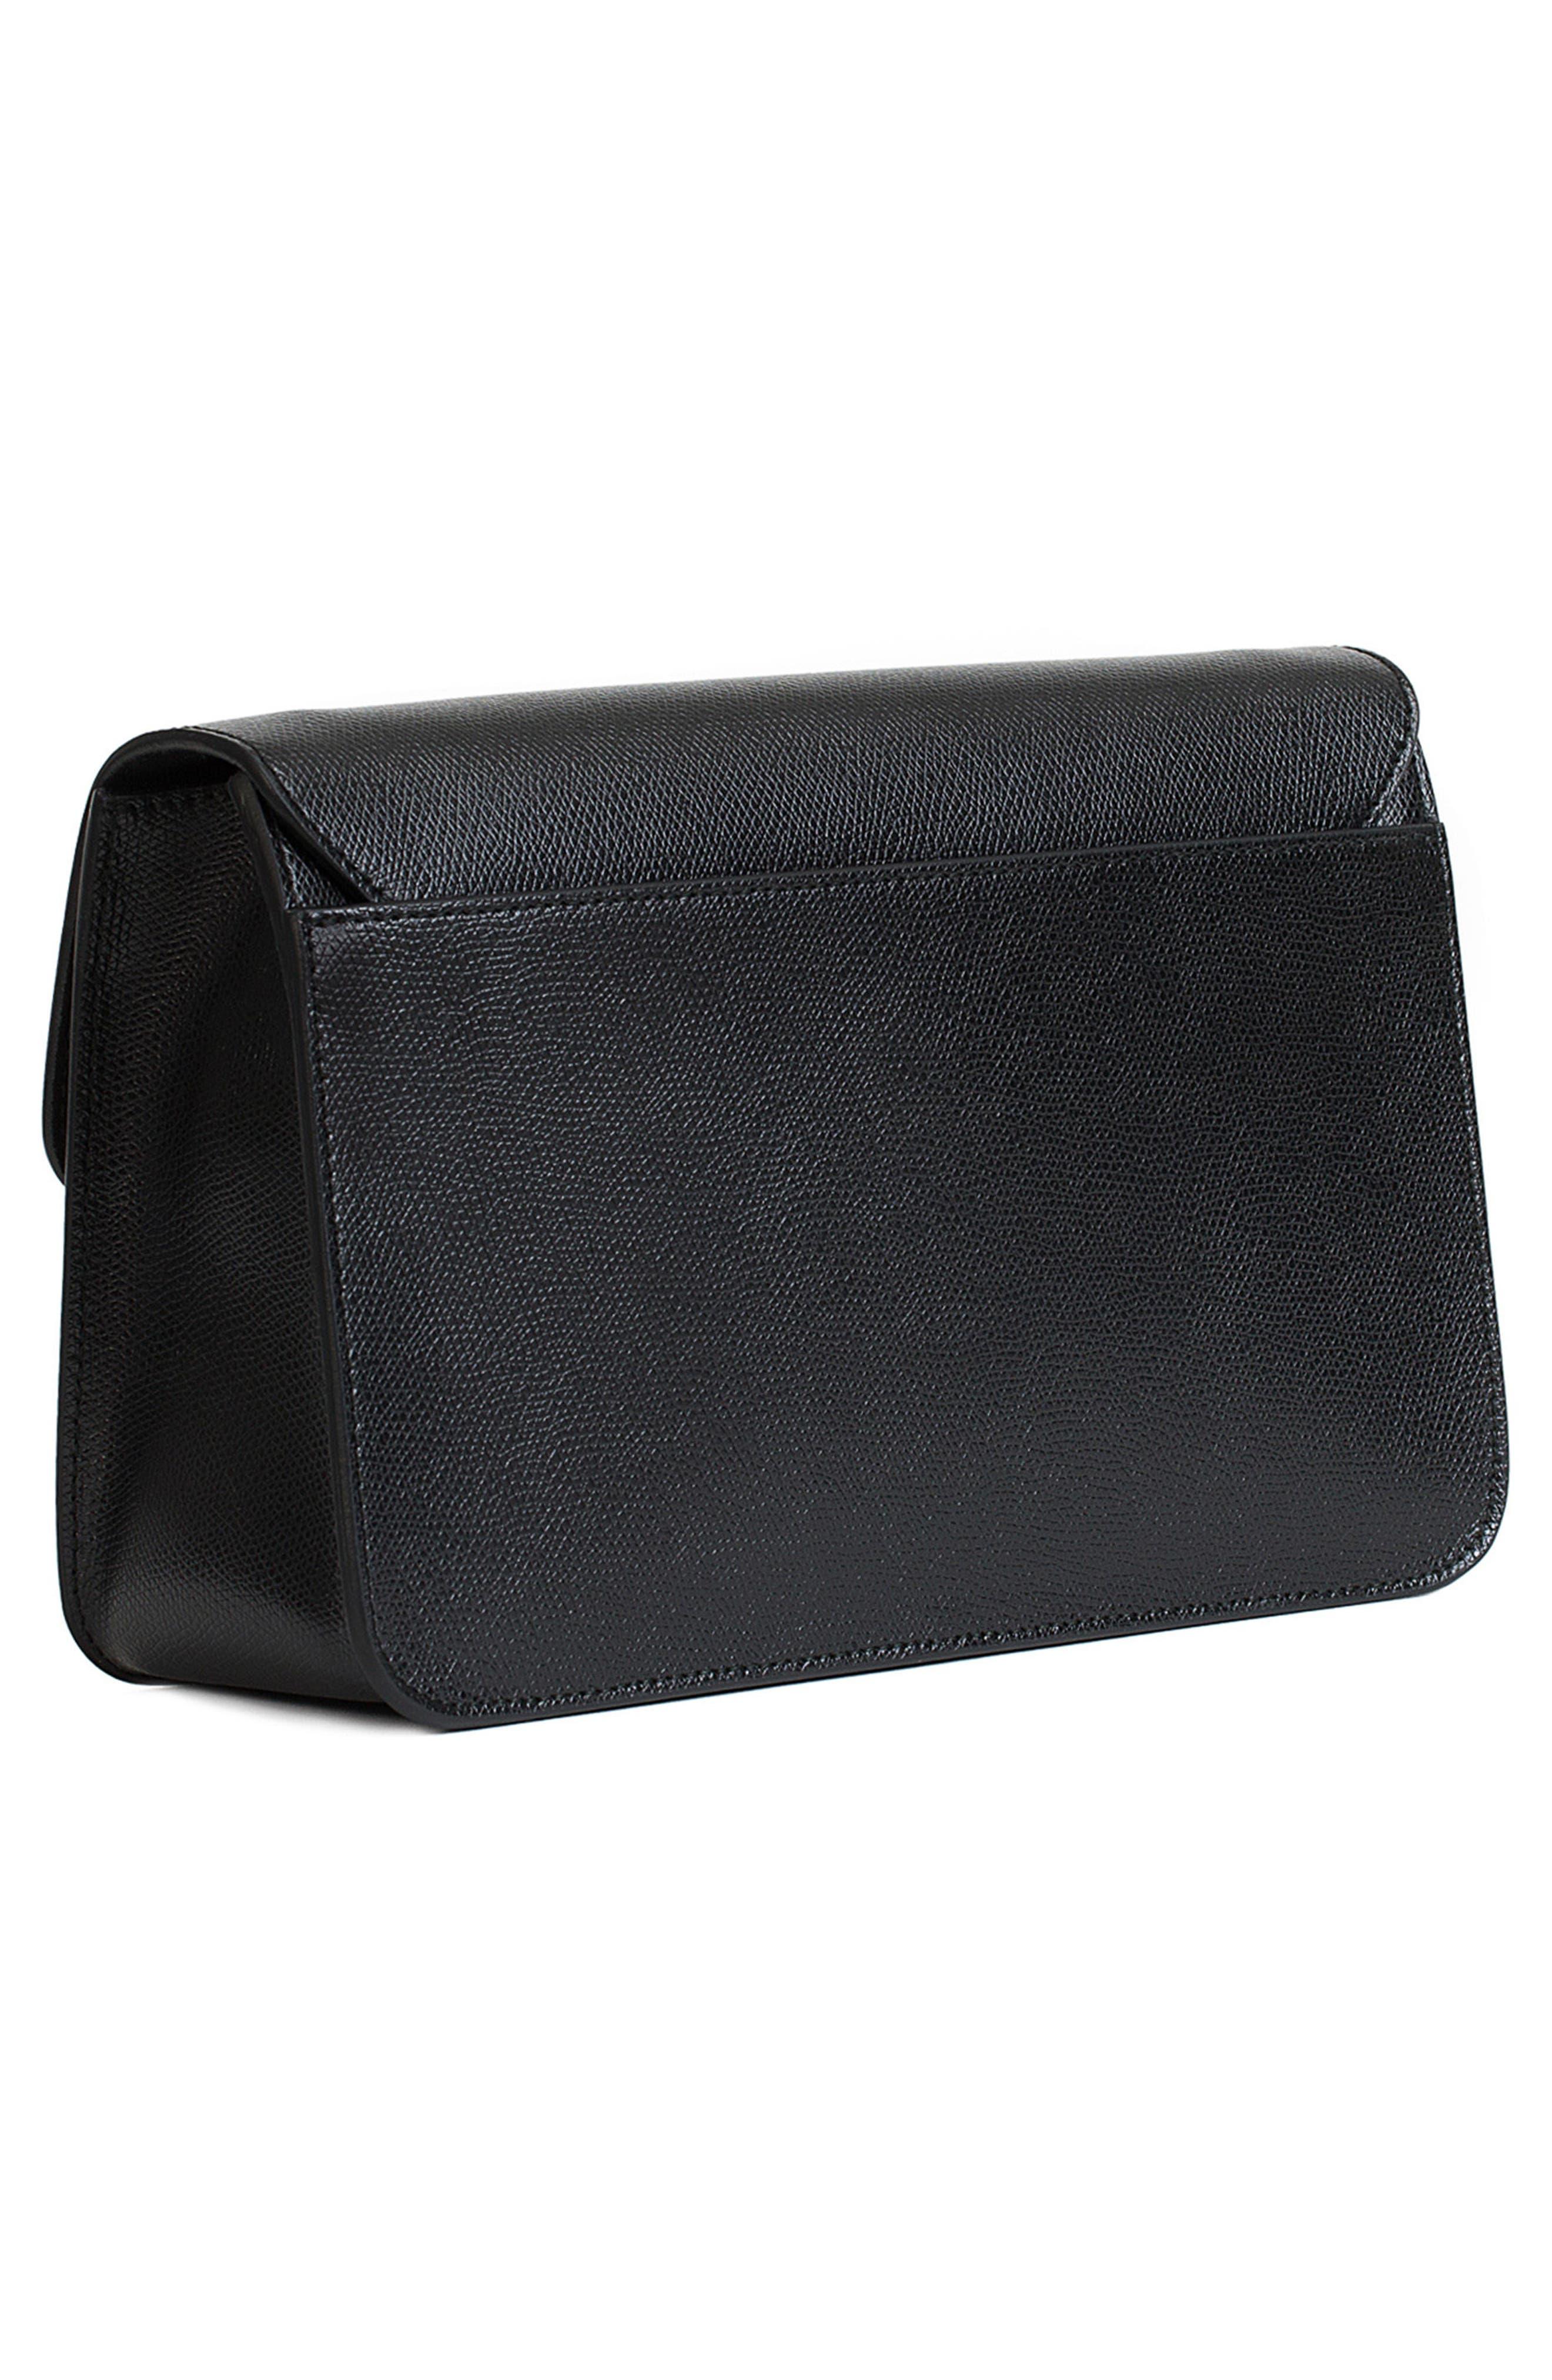 Small Metropolis Leather Crossbody Bag,                             Alternate thumbnail 2, color,                             Onyx